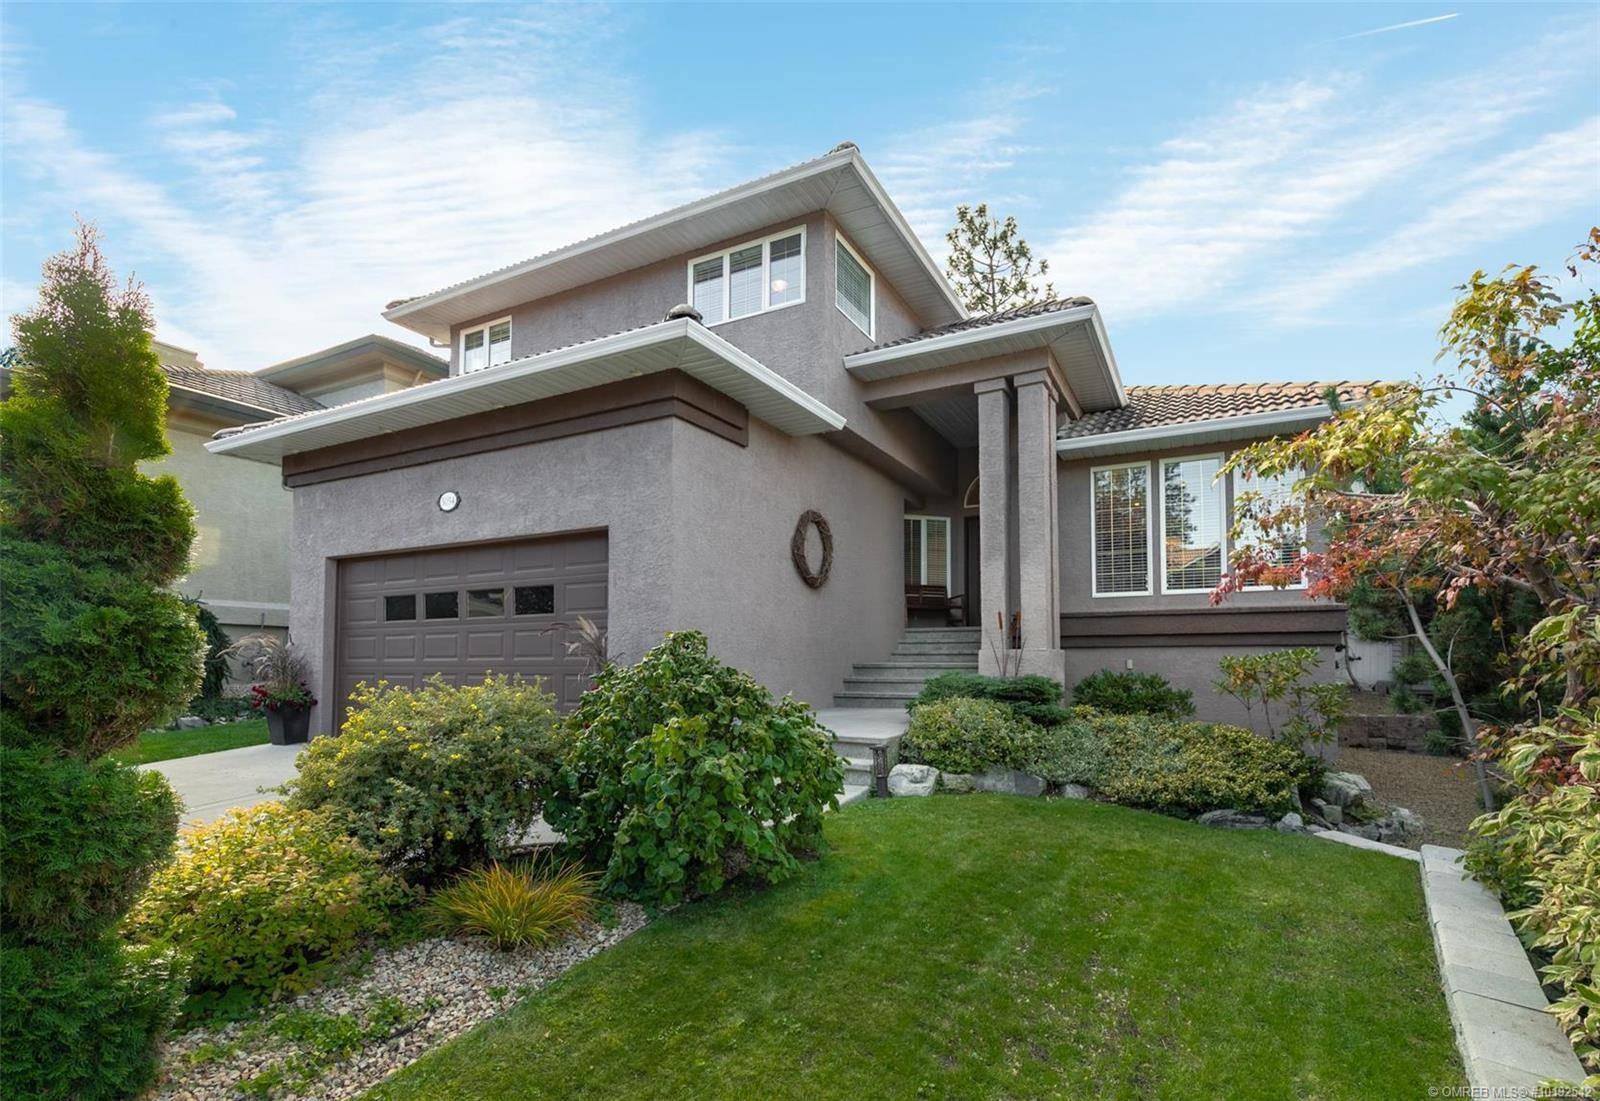 House for sale at 3054 Quail Run Dr Kelowna British Columbia - MLS: 10192542